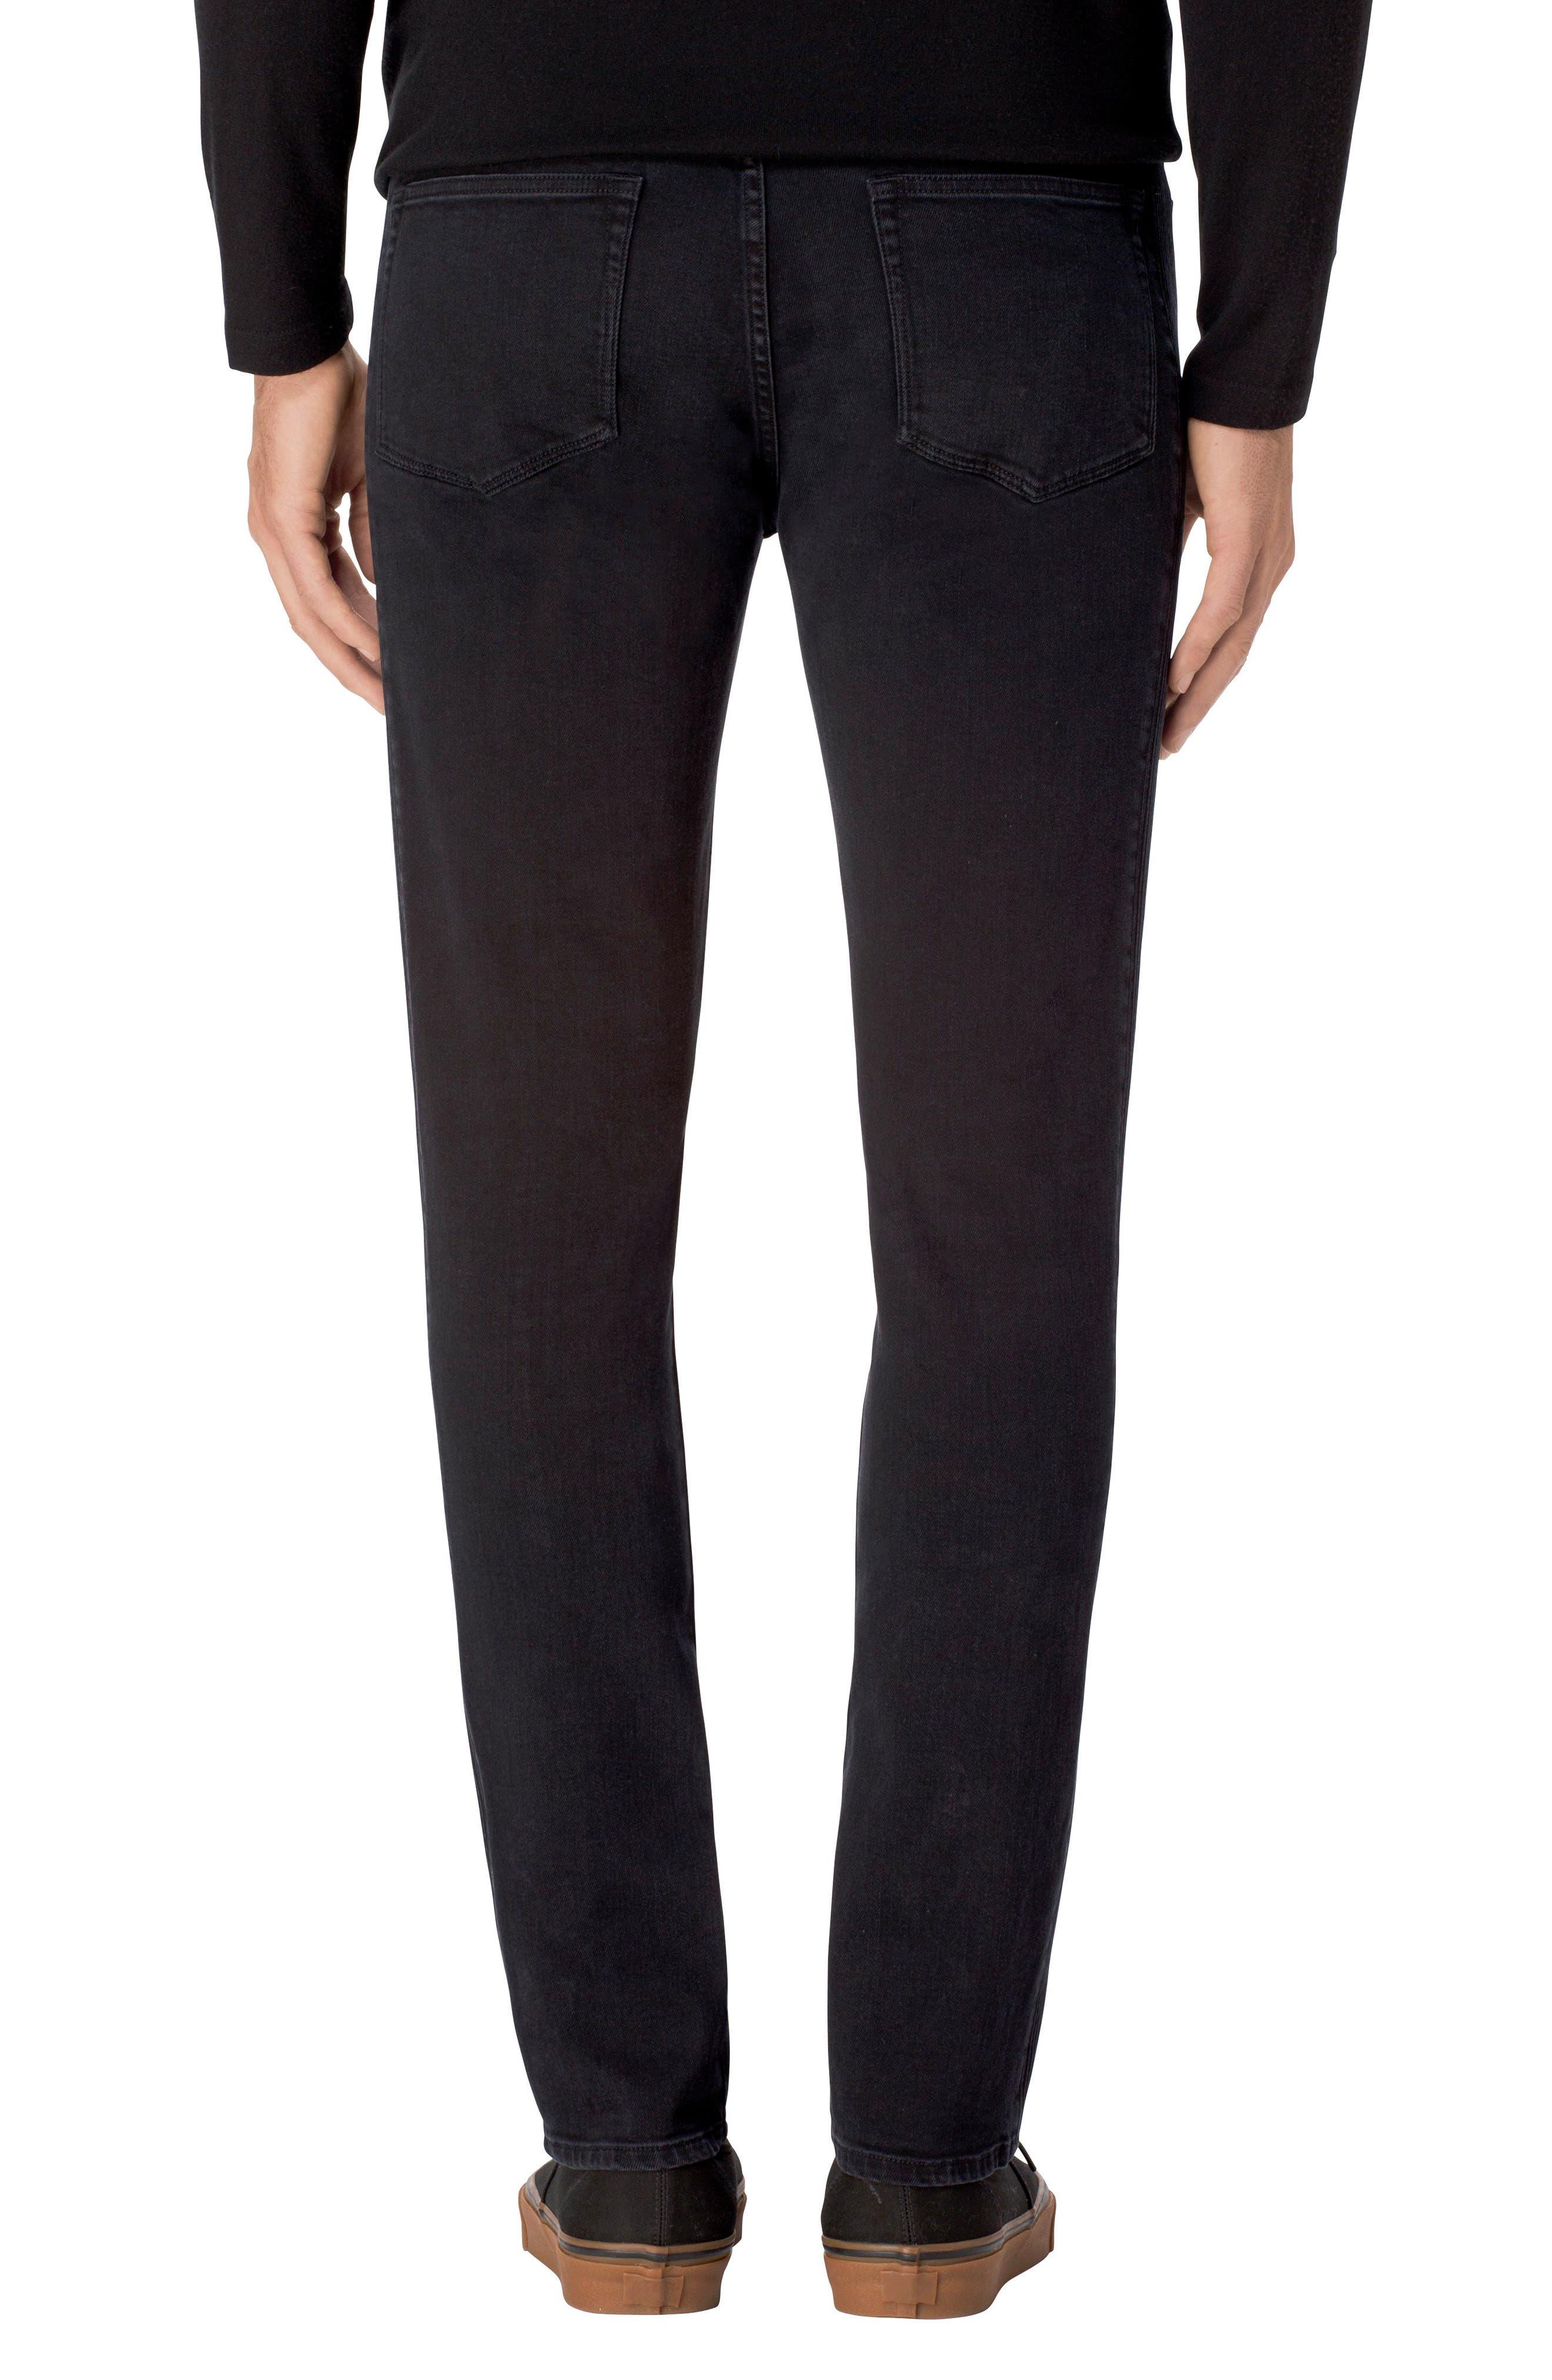 Alternate Image 2  - J Brand Parallax Moto Skinny Fit Jeans (Hype)